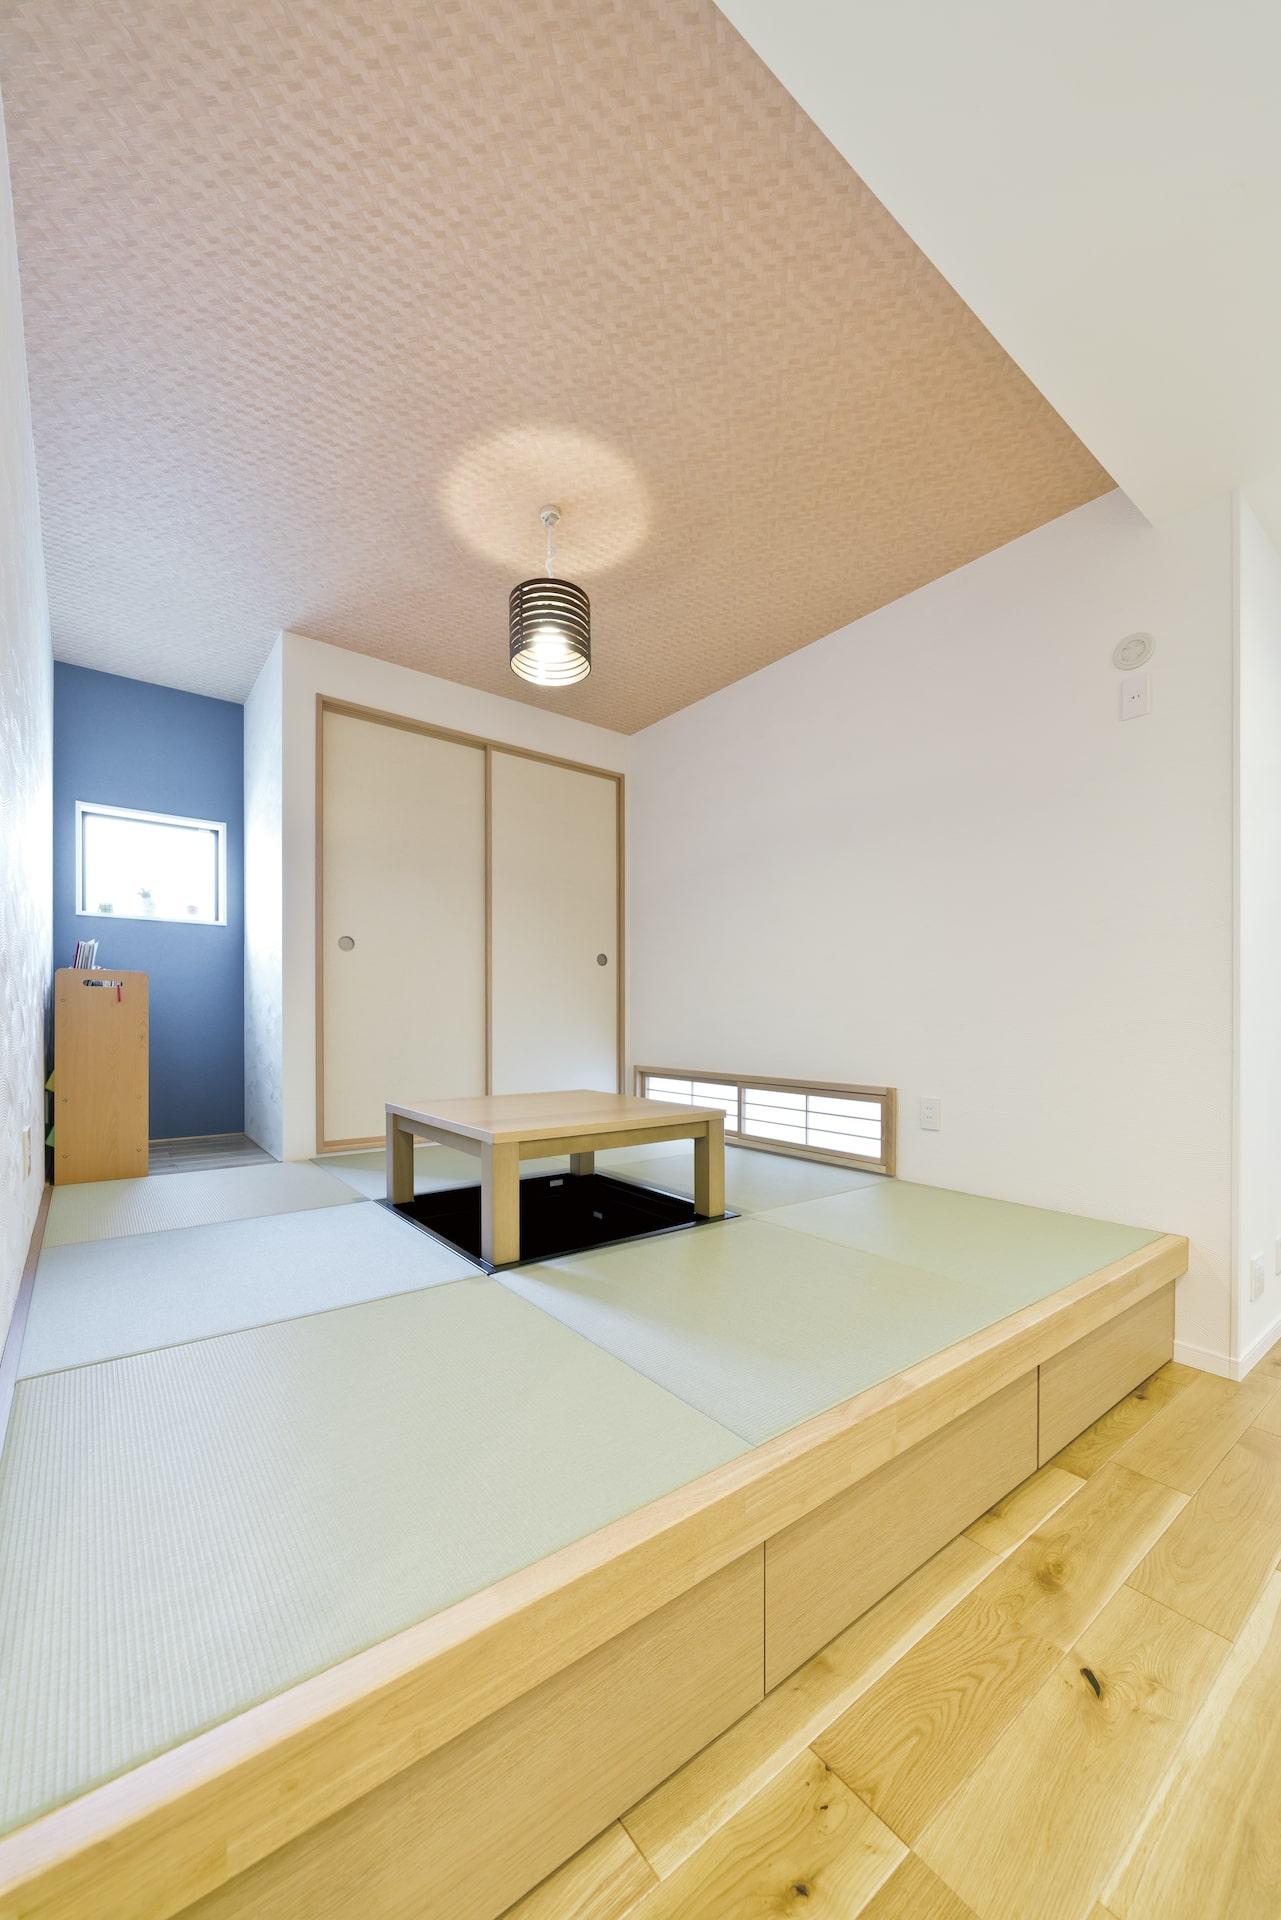 寝屋川市,新築戸建,注文住宅,土地探し,上野工務店,リビング,和室